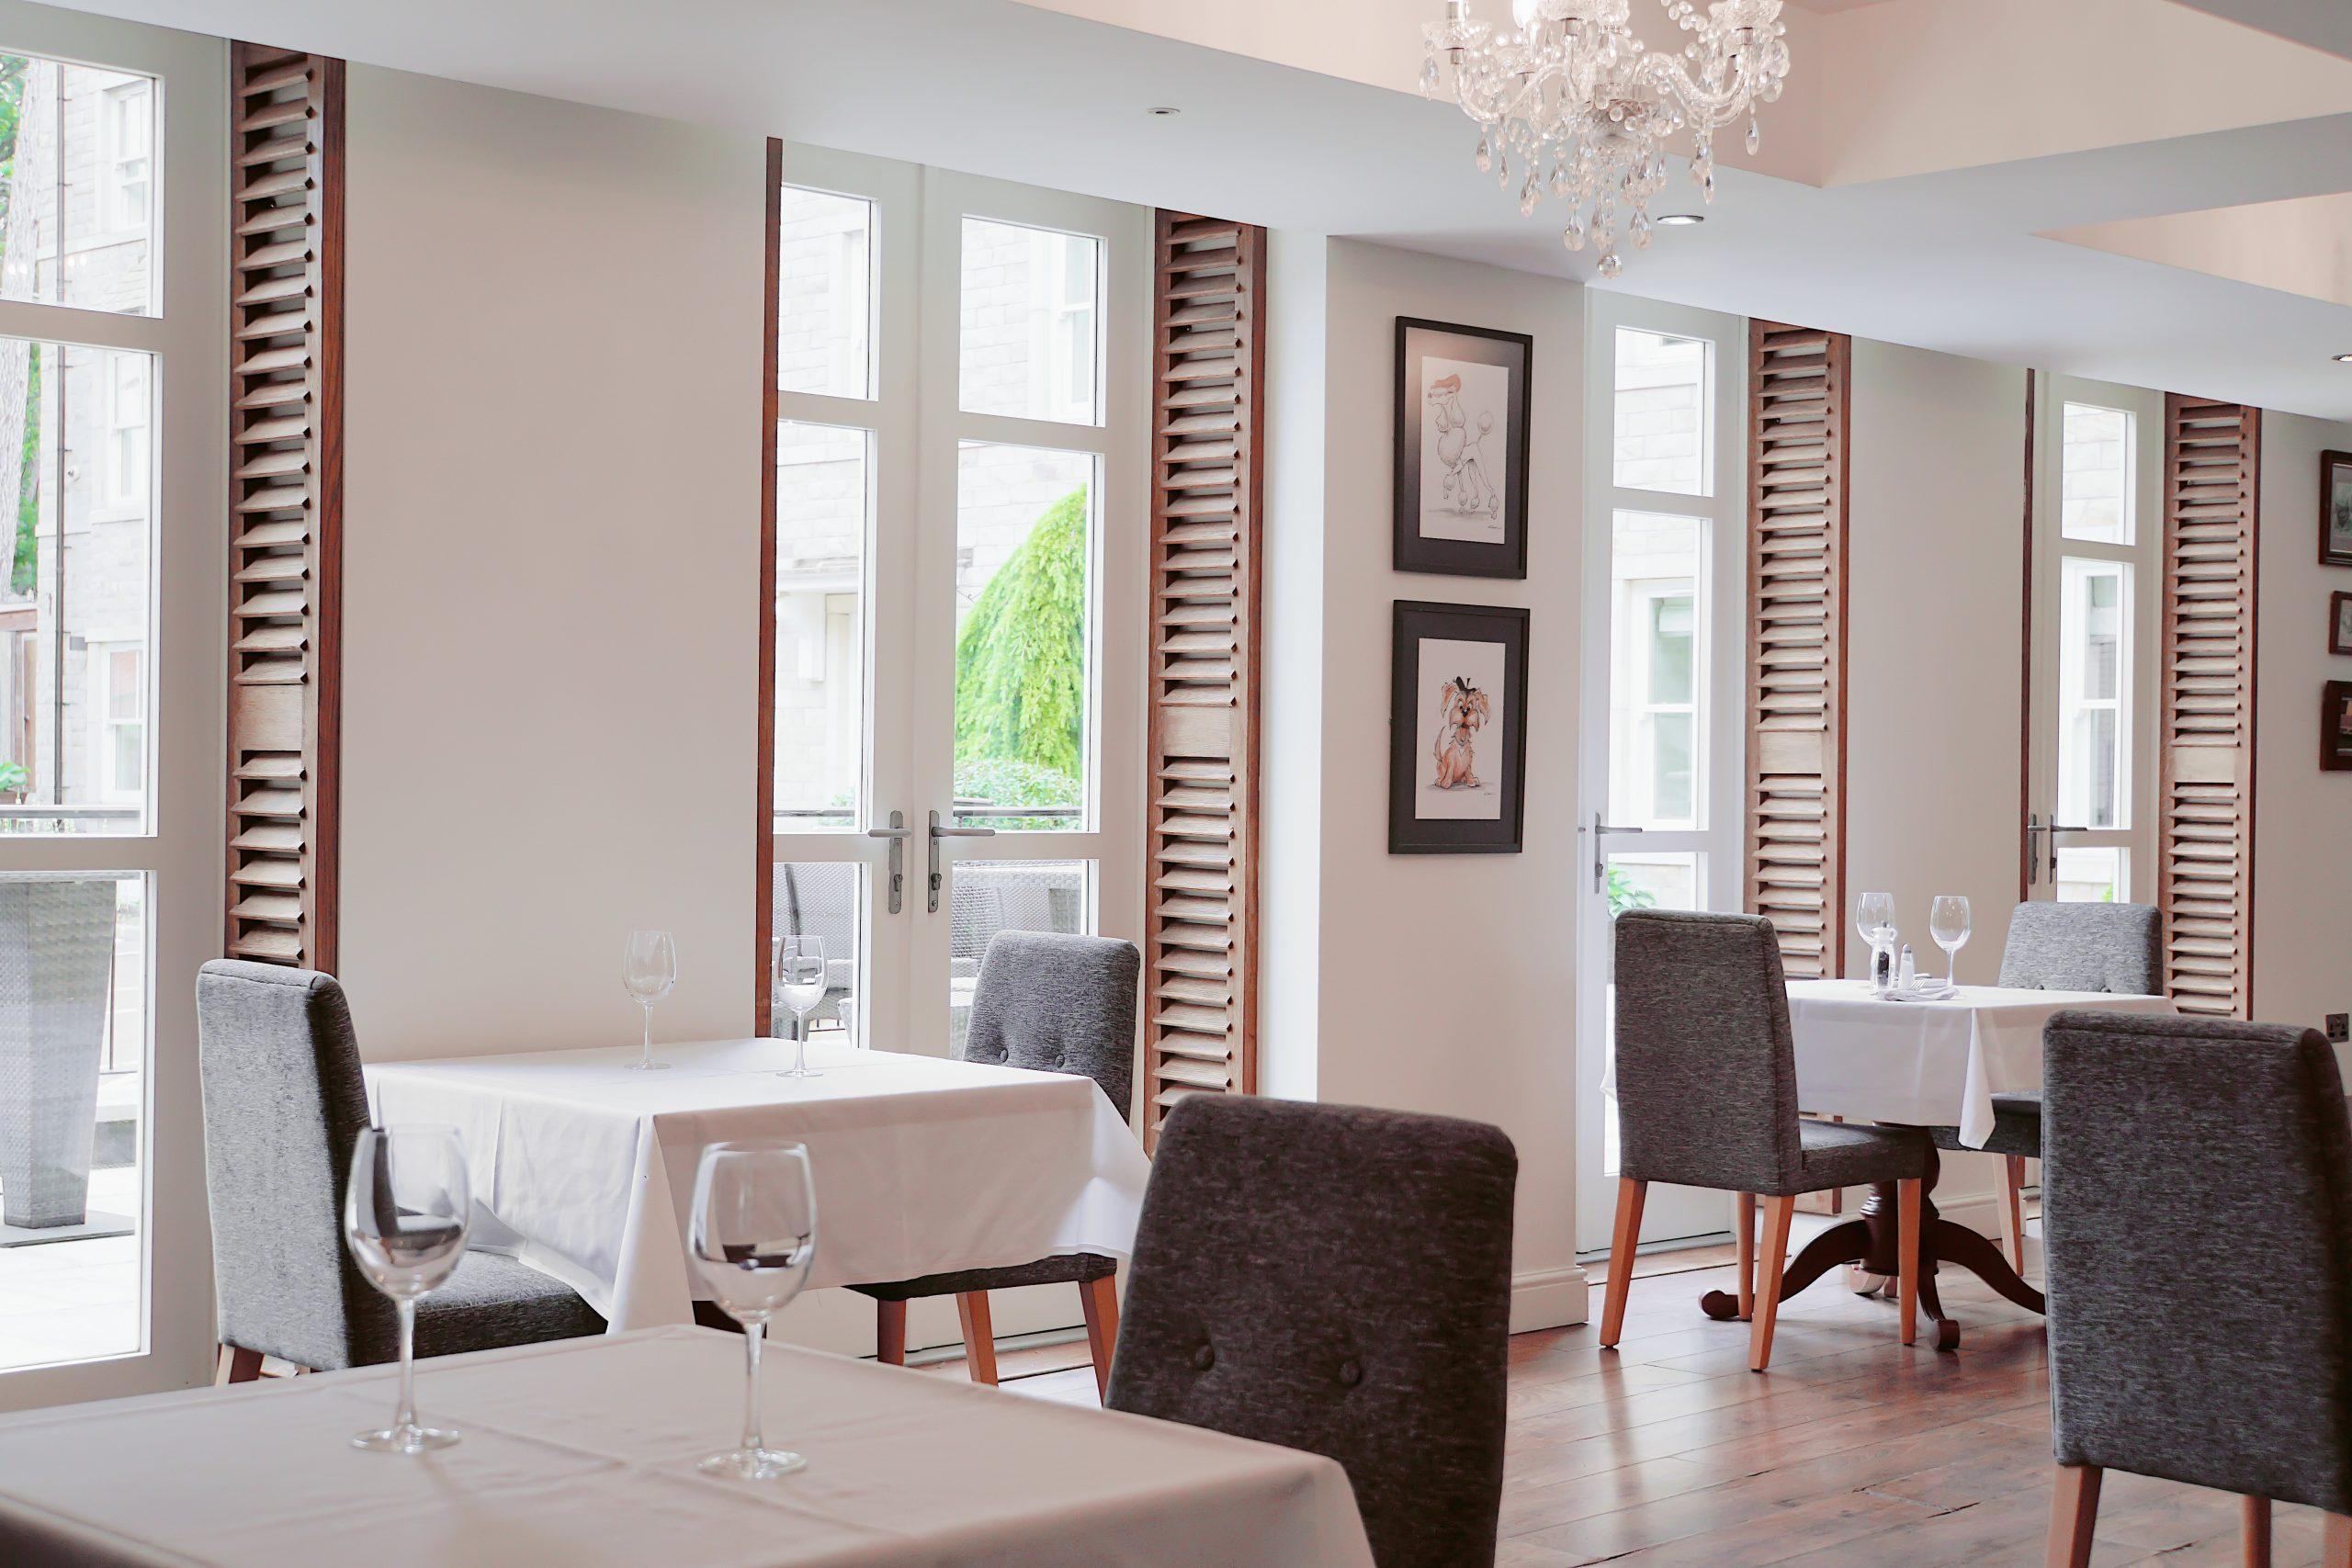 Eat at Raithwaite Sandsend